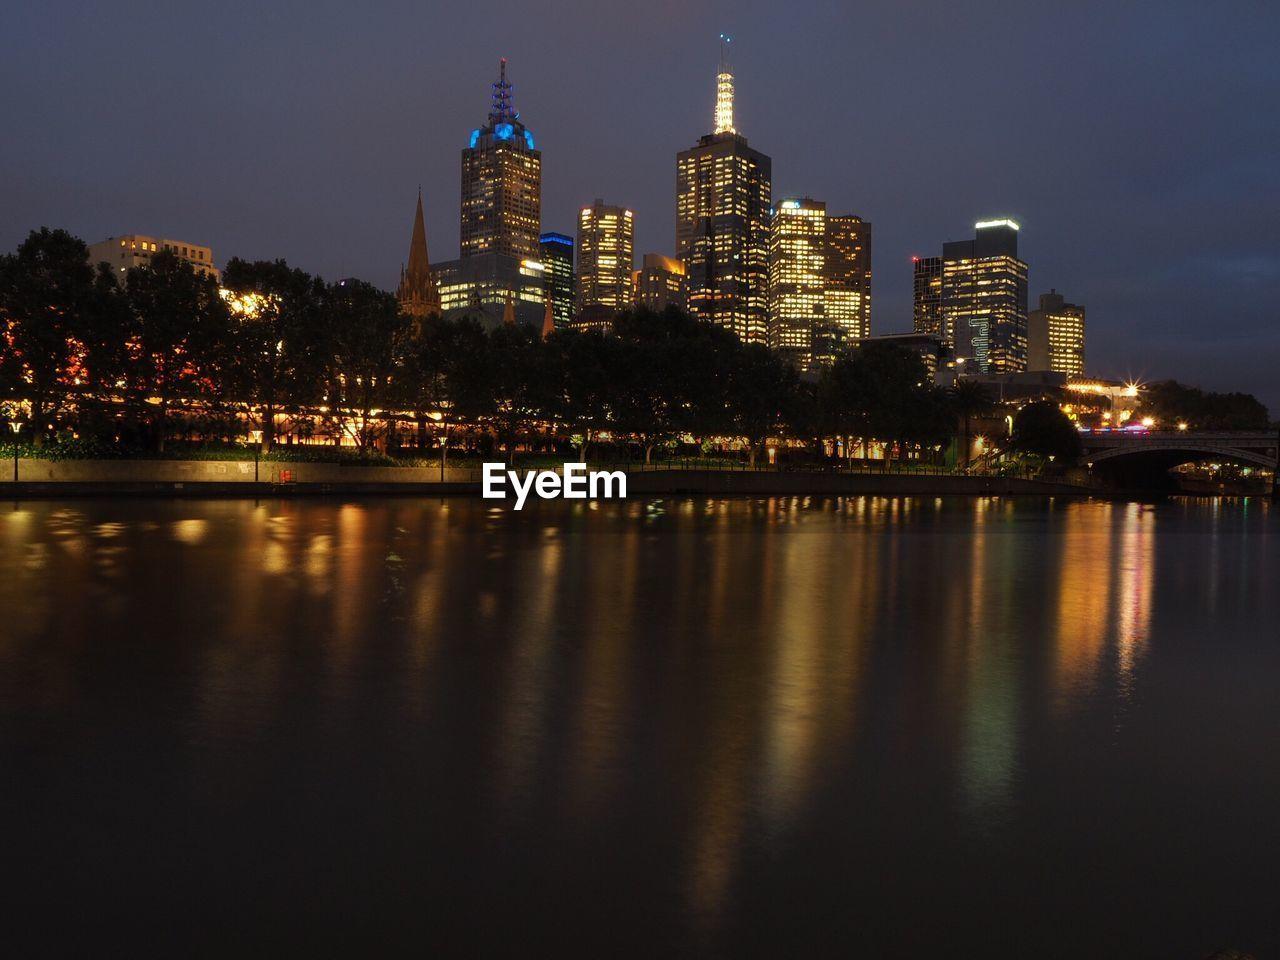 River In Illuminated City At Night